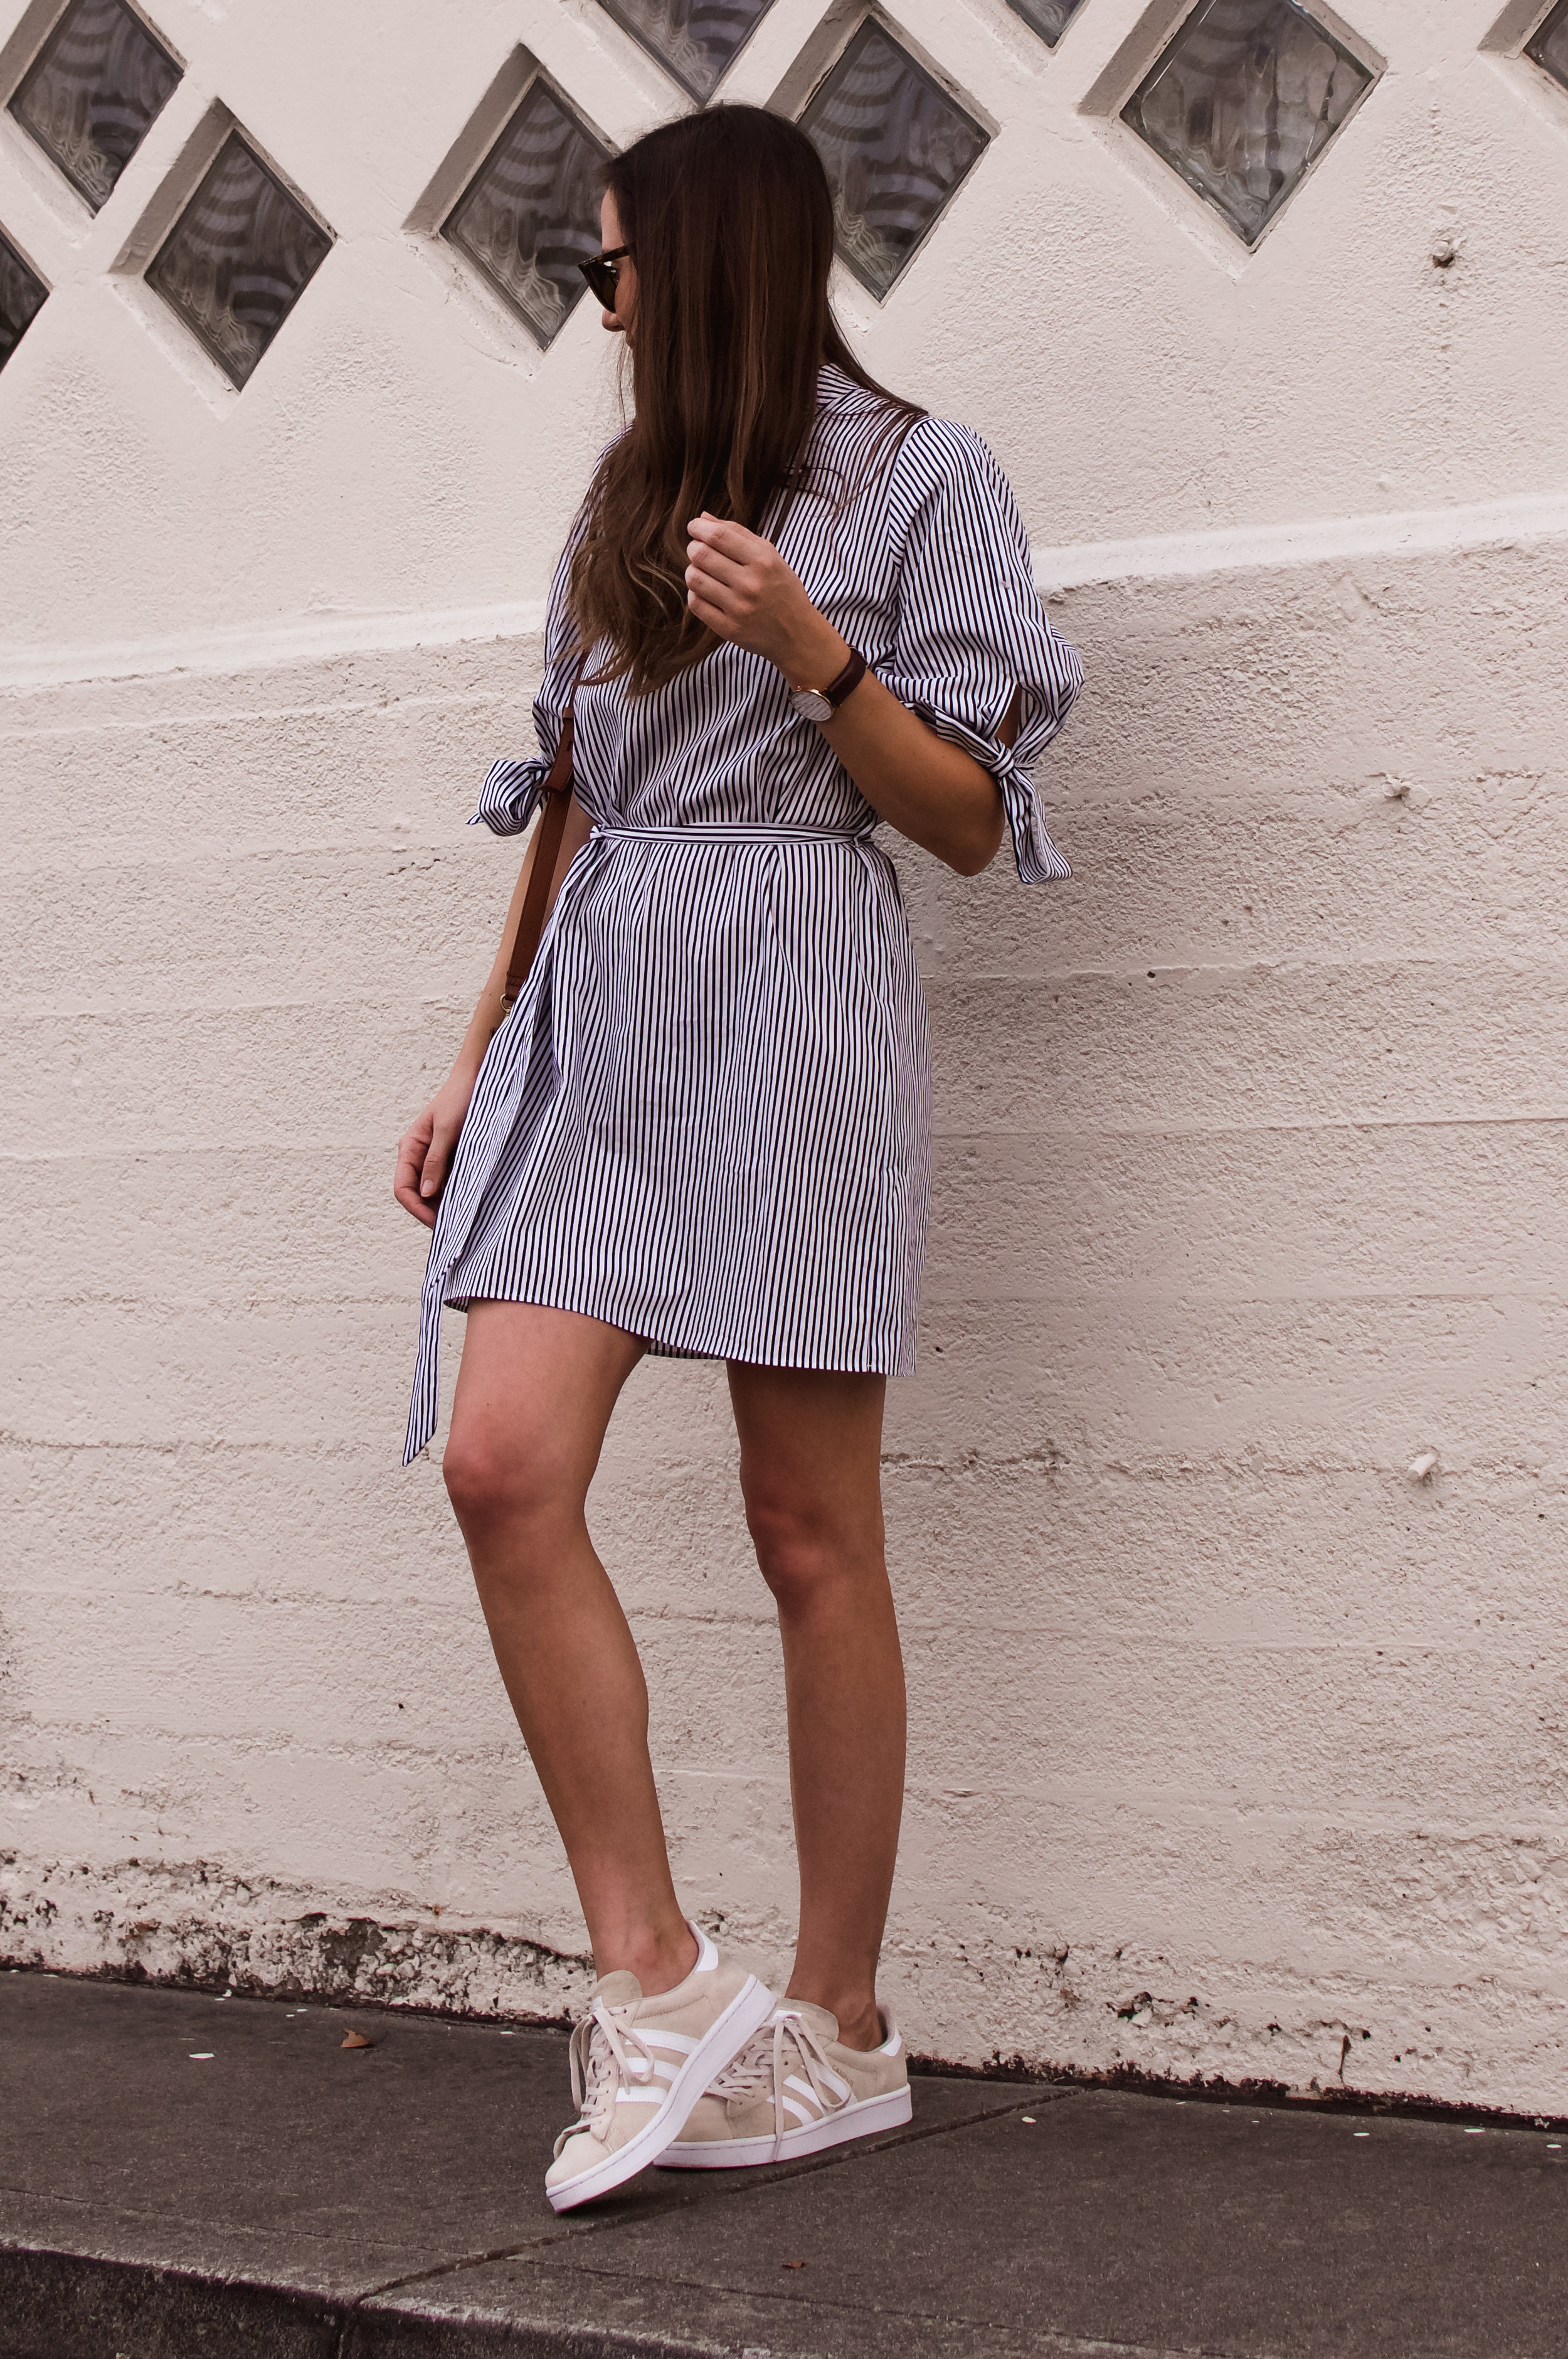 Shop the Look Below.  Topshop Dress  |  Adidas Sneakers  |  Madewell Bag  |  Ray-Ban Sunglasses